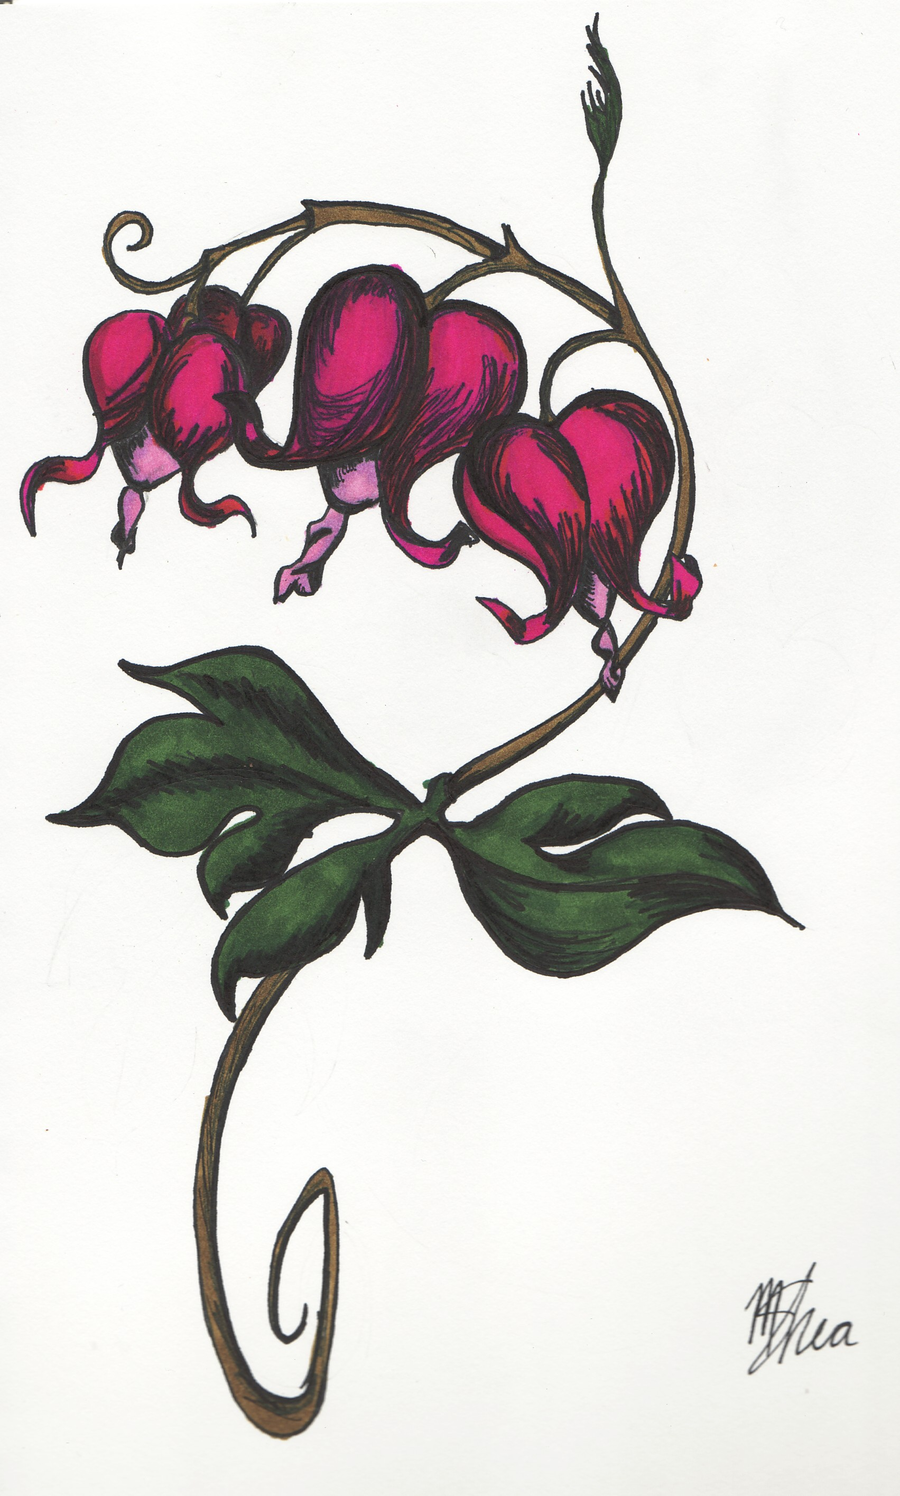 Beautiful Bleeding Heart Tattoo By Mikeashworthtattoos On Deviantart Bleeding Heart Tattoo Heart Flower Tattoo Flower Tattoo Meanings